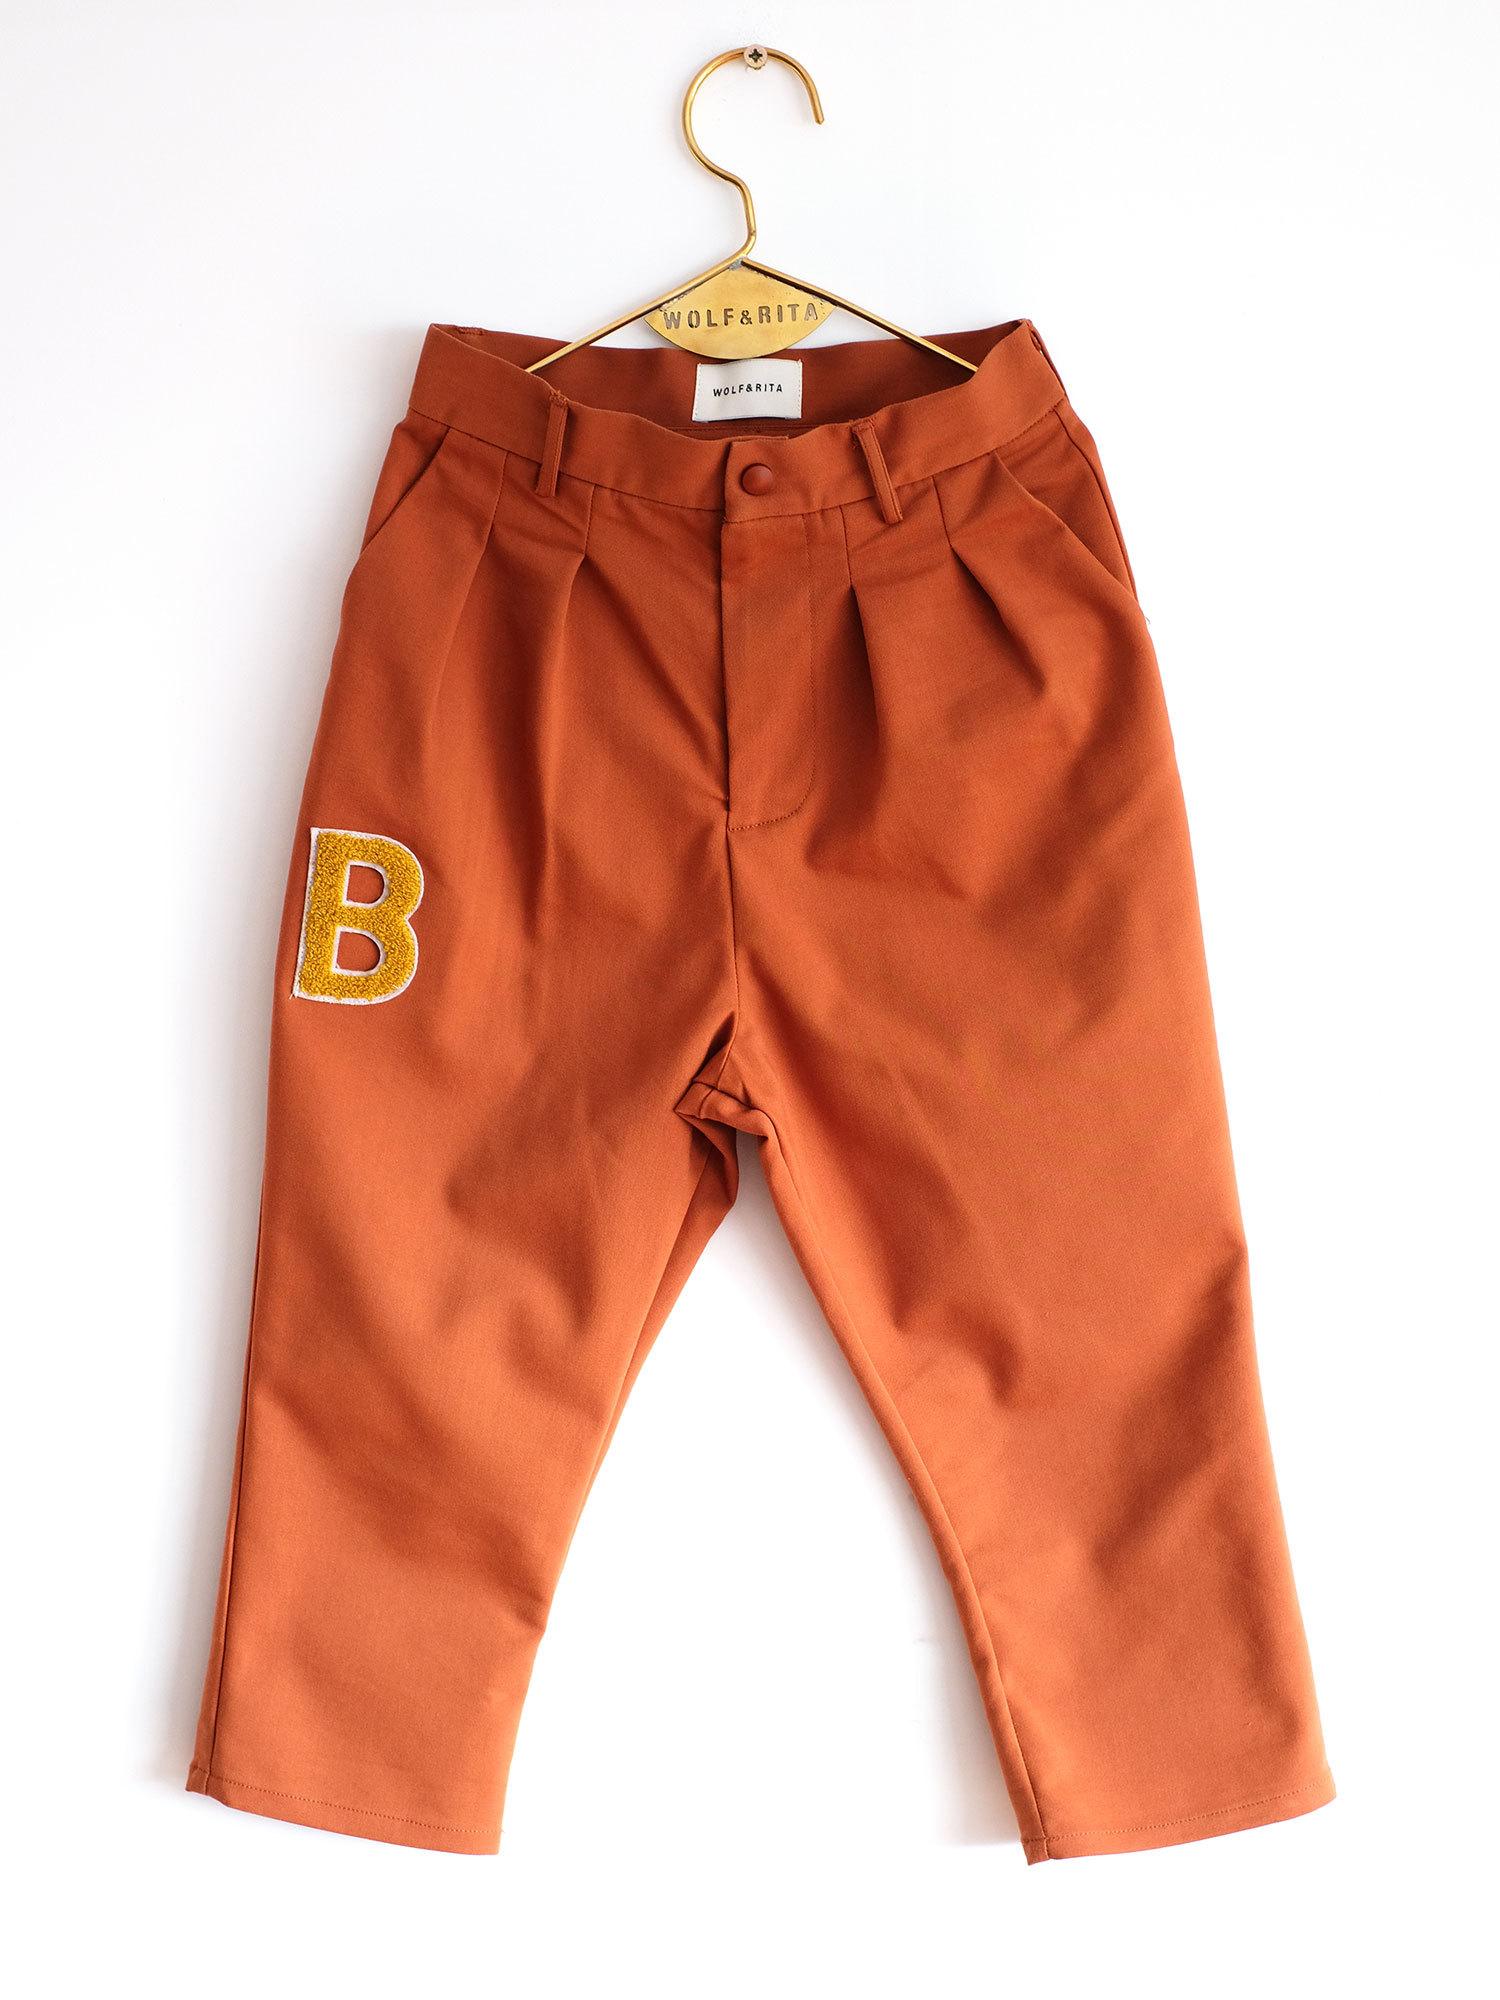 《WOLF & RITA 2017AW》Andre trousers / orange